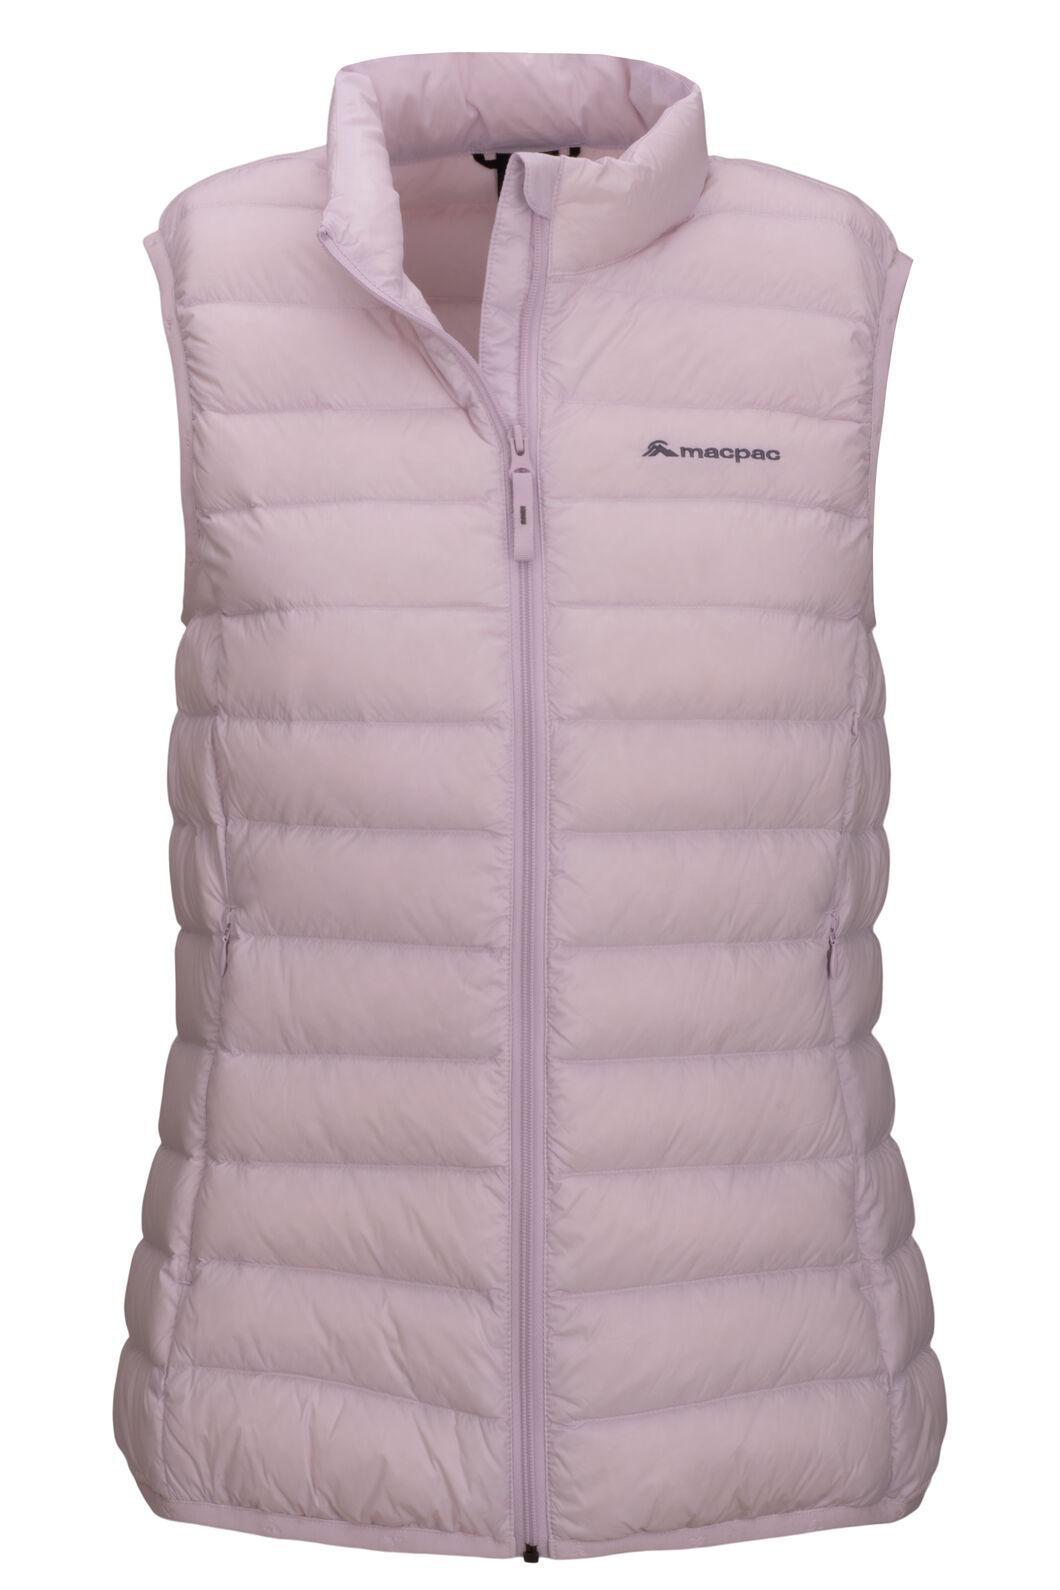 Macpac Women's Uber Light Down Vest, Orchid Hush, hi-res